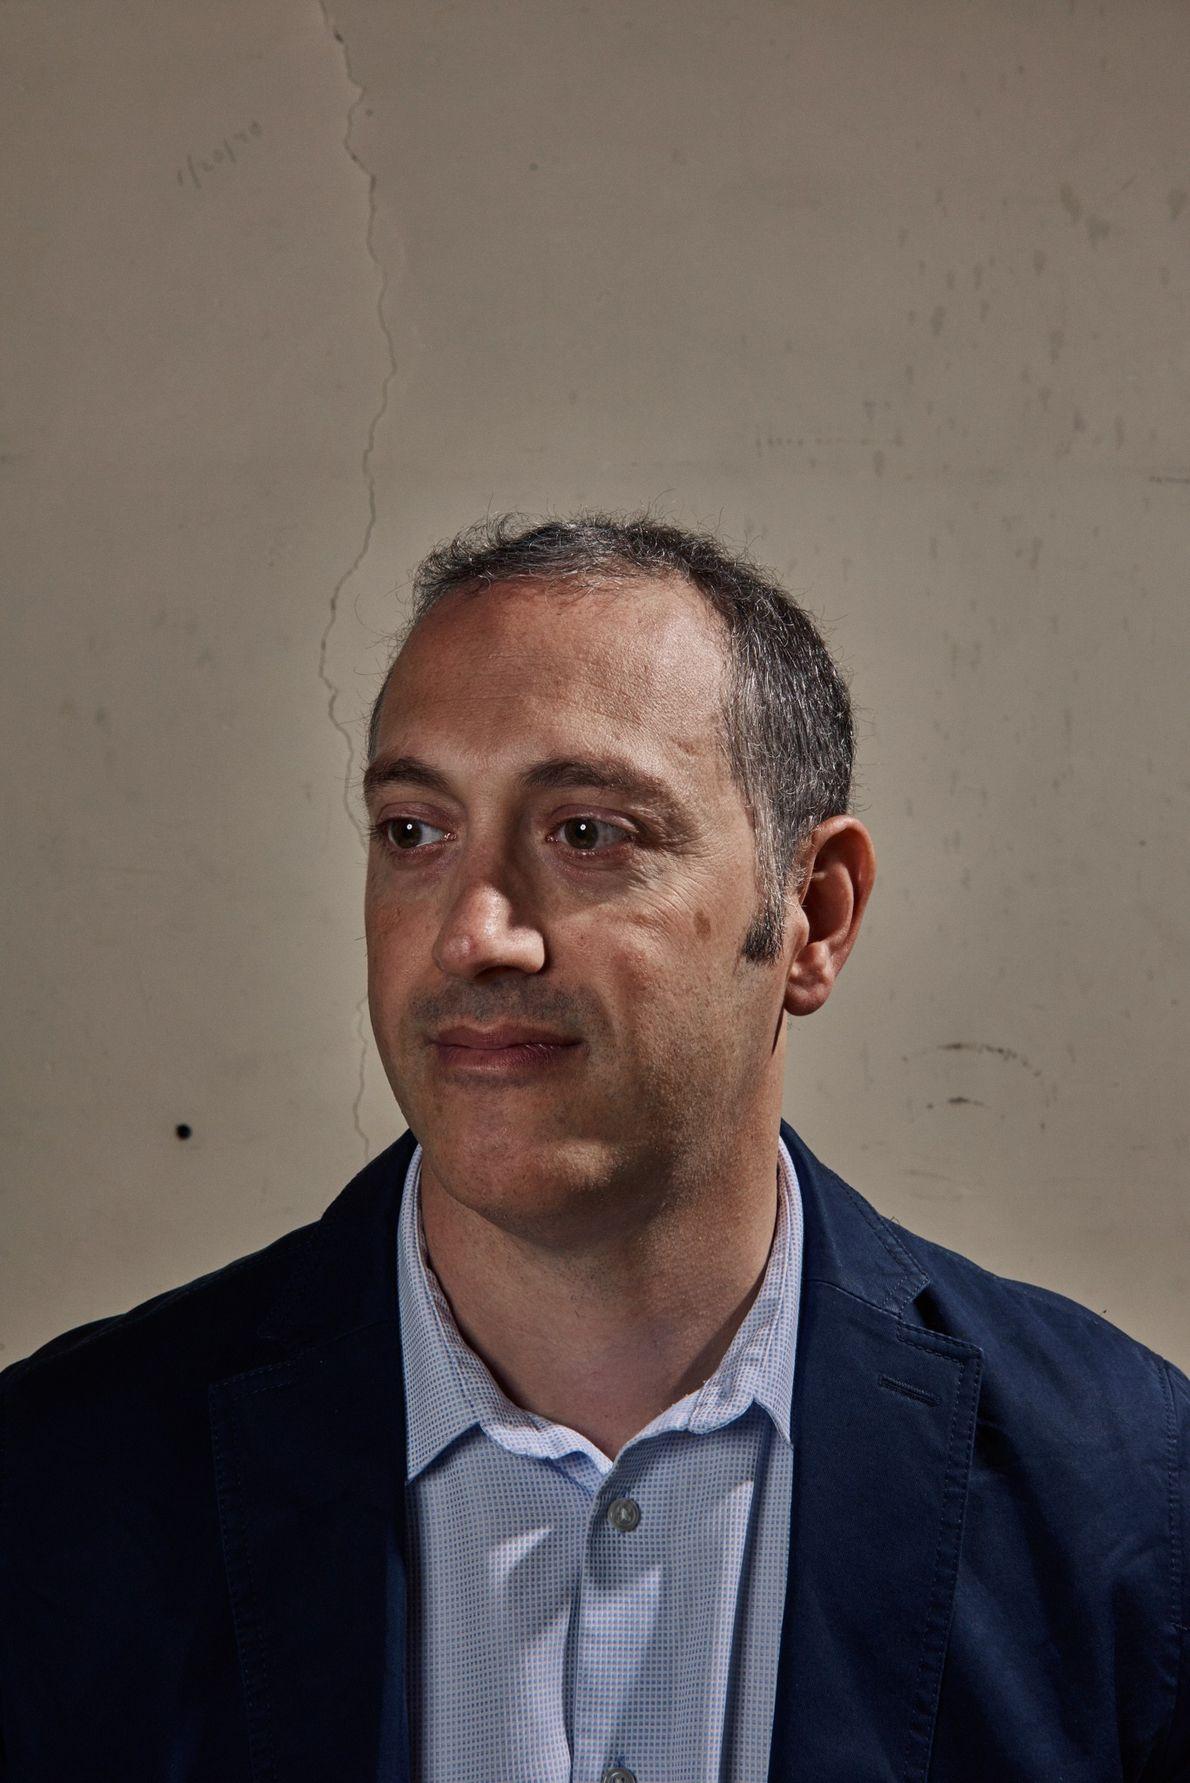 Gianpaolo Carosi, ADMX's co-spokesperson and a scientist at Lawrence Livermore National Laboratory.